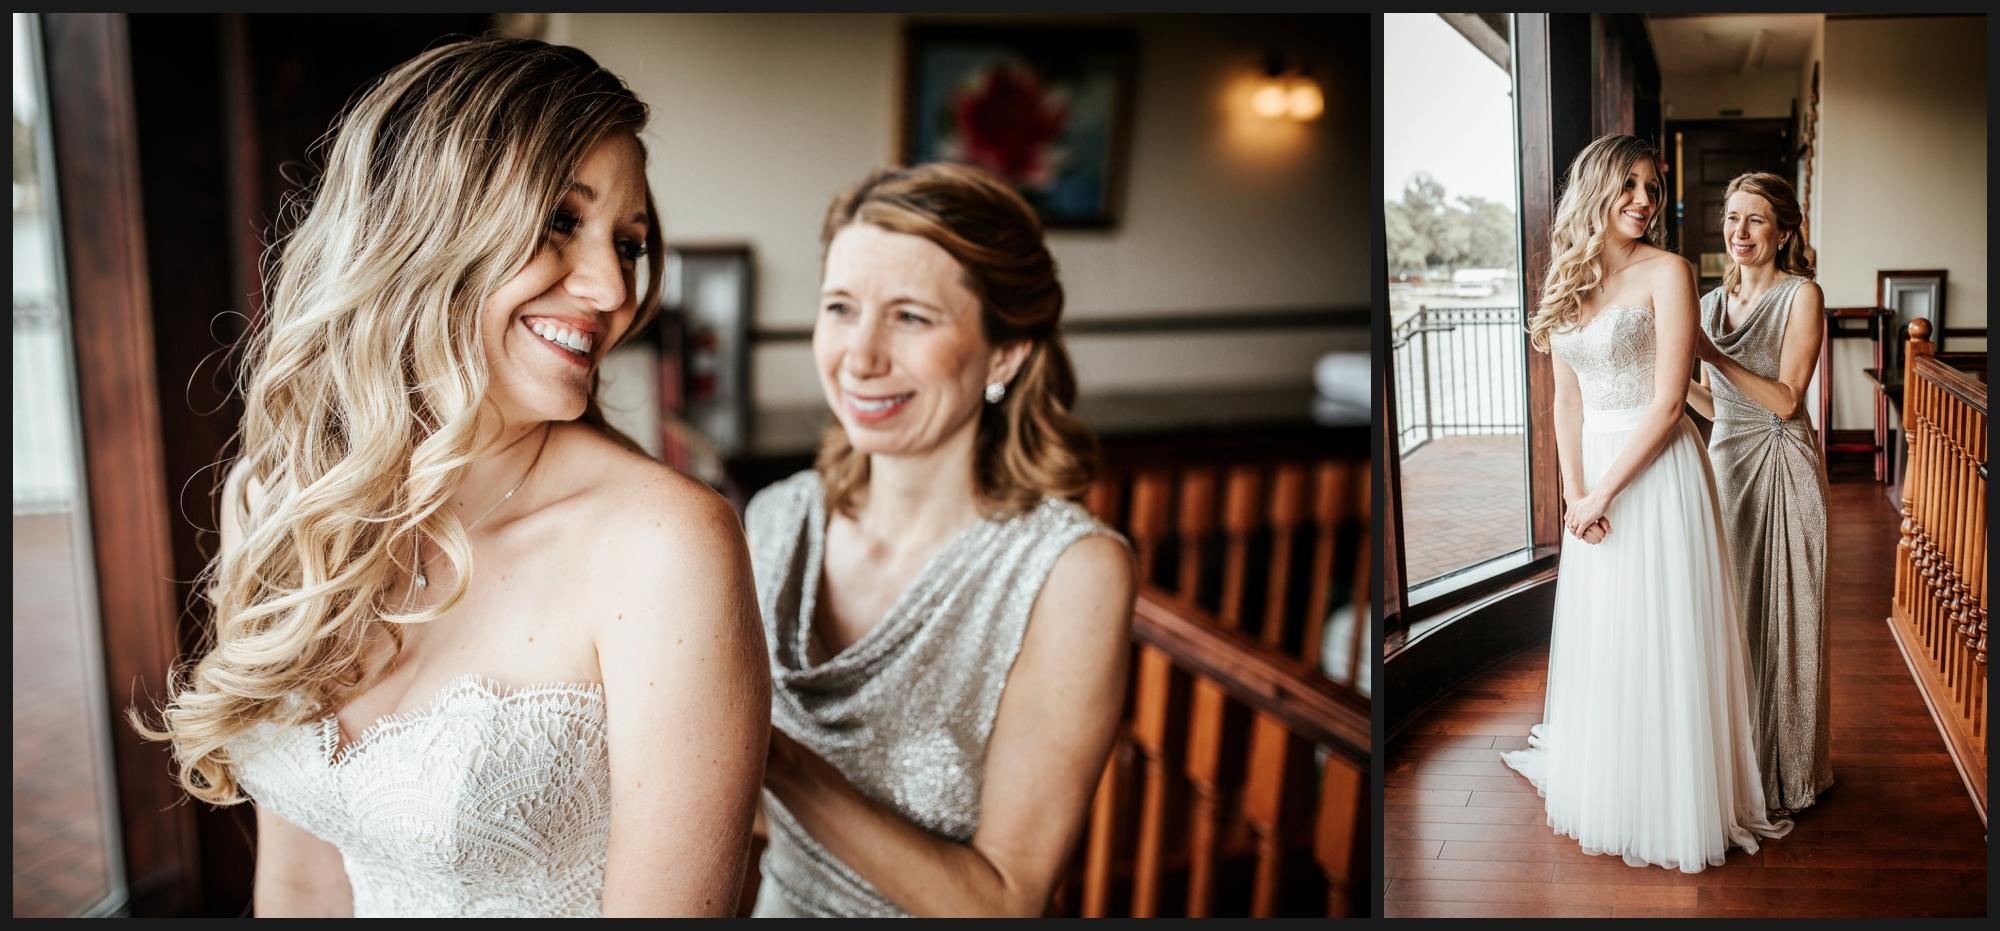 Orlando-Wedding-Photographer-destination-wedding-photographer-florida-wedding-photographer-bohemian-wedding-photographer_0223.jpg